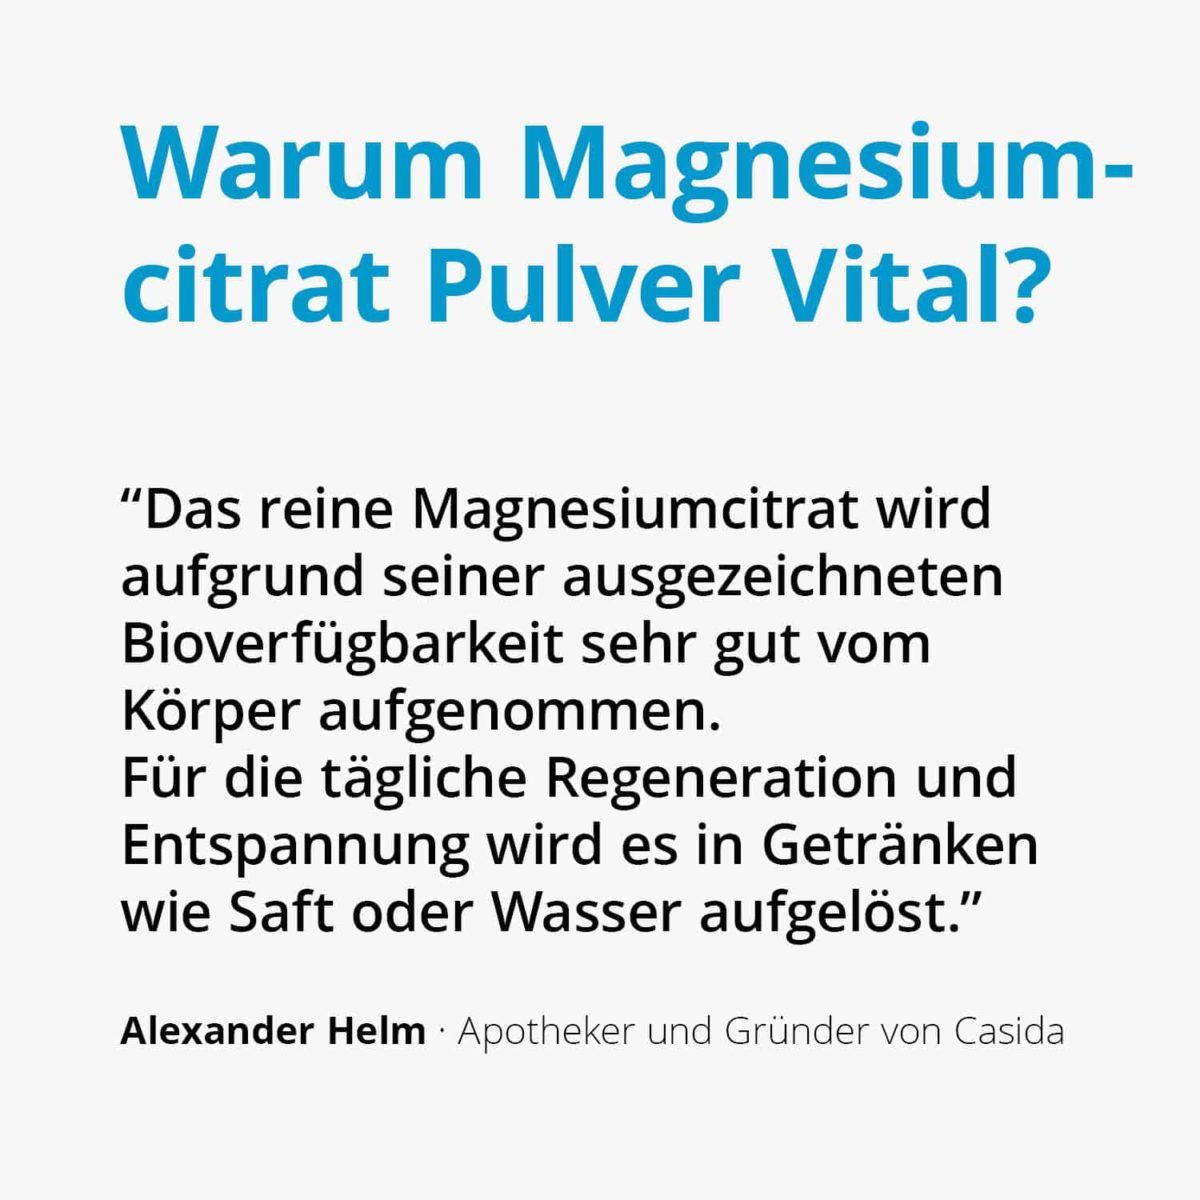 Casida Magnesiumcitrat Pulver Vital 200 g 11316290 PZN Apotheke Regeneration trinken Muskelentspannung2